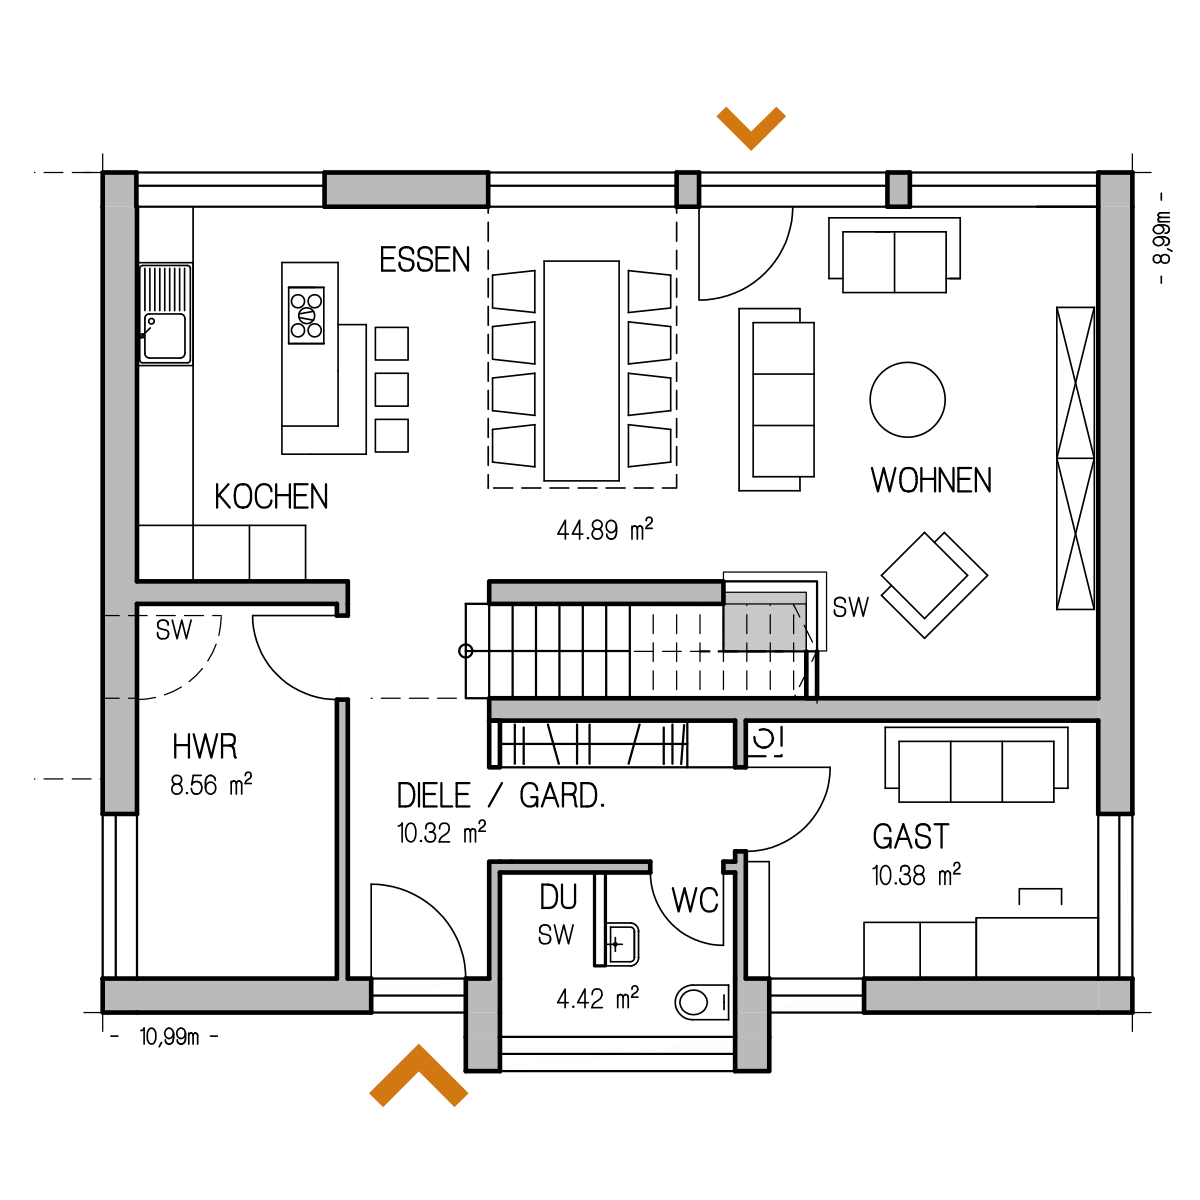 RKR Haus Grundriss Plan Haustyp Musterhaus Individuell